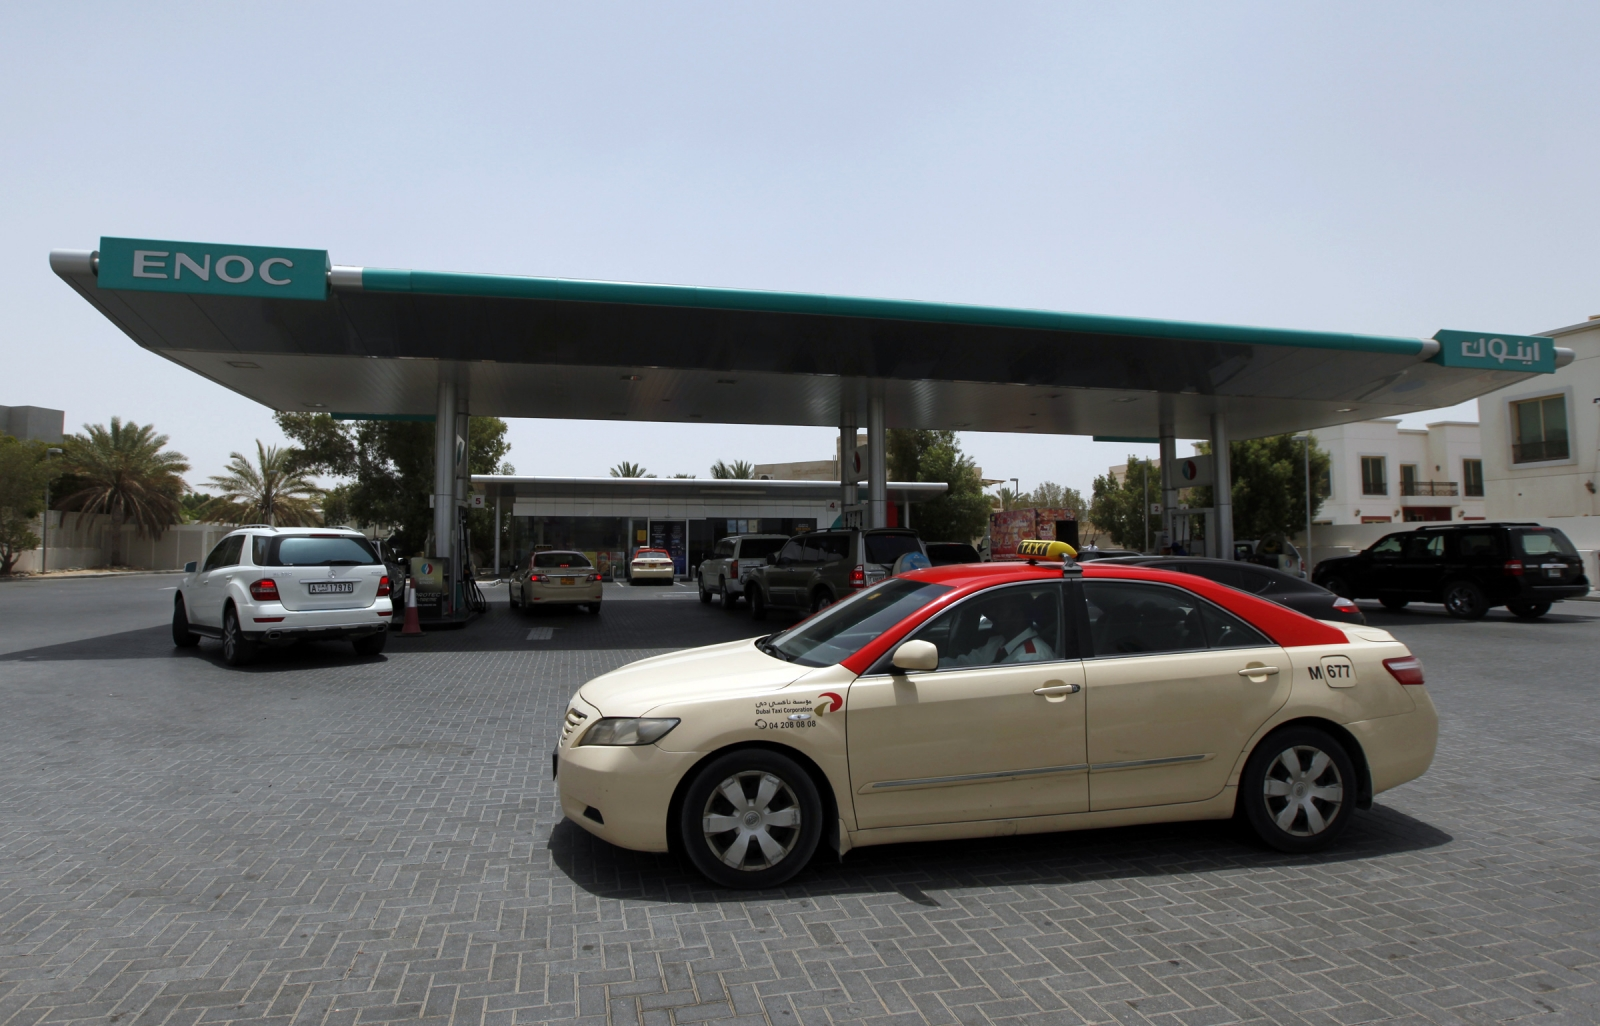 Enoc fuel station in Dubai